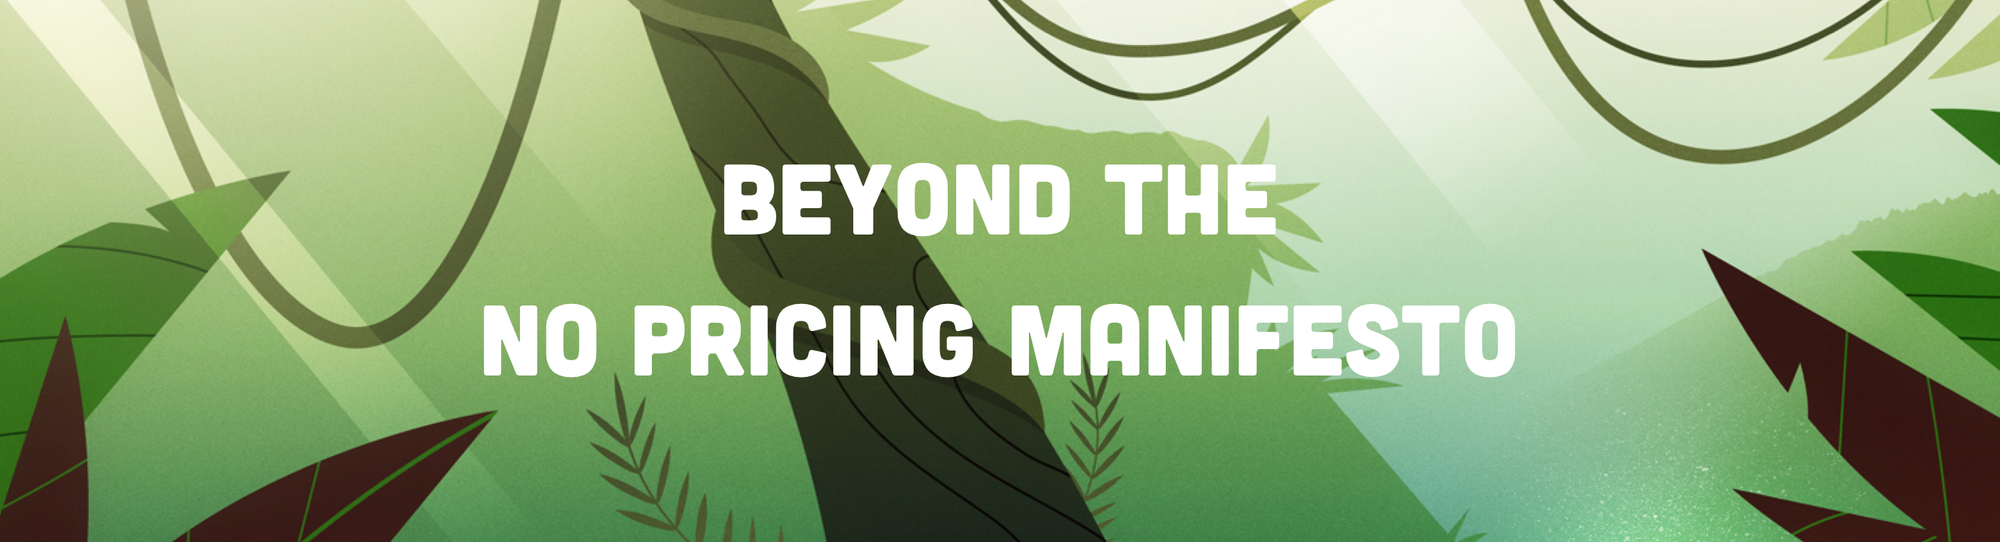 Beyond the No Pricing Manifesto